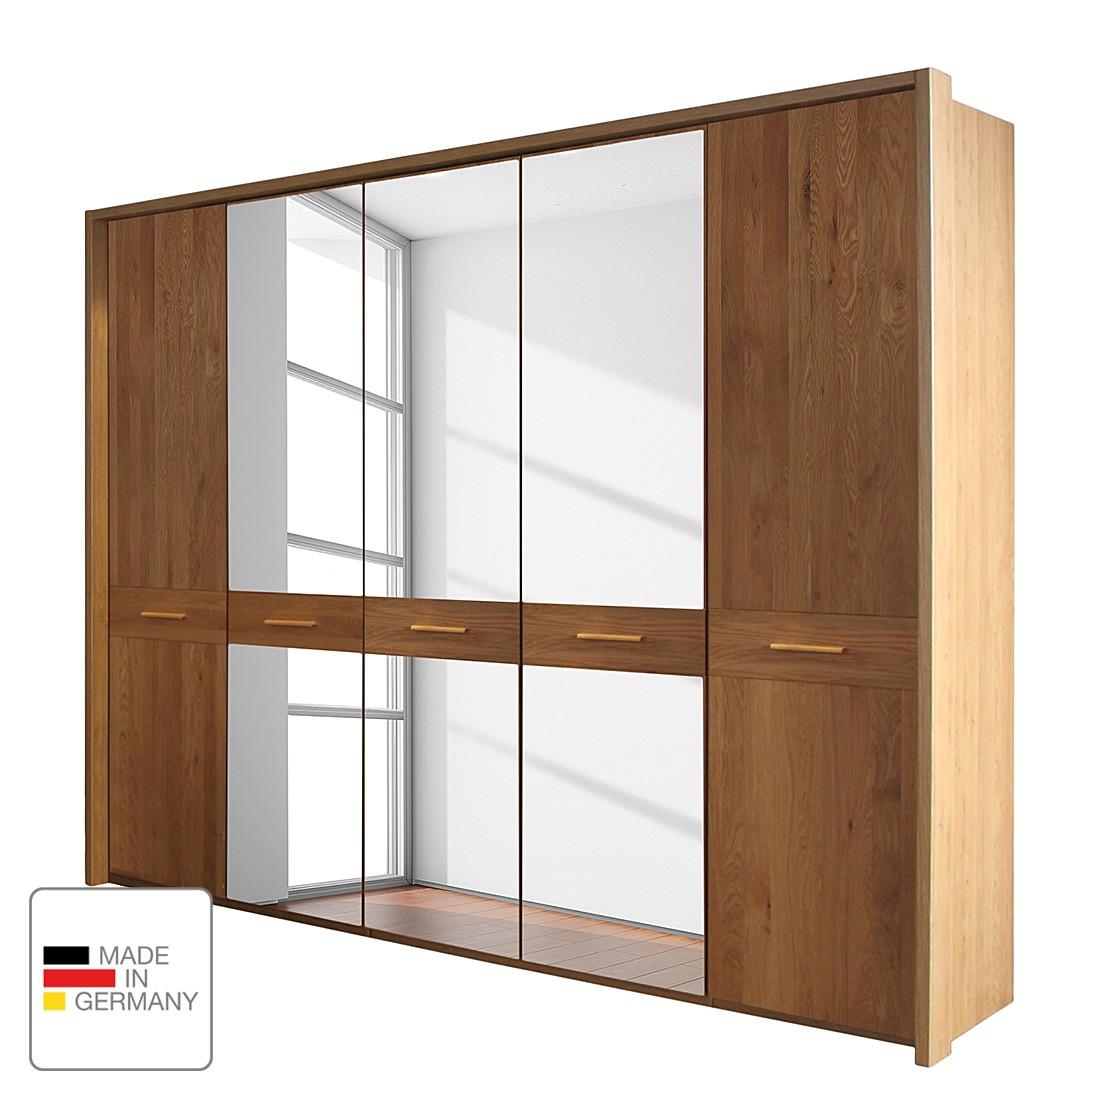 Draaideurkast Faro - gelakt deels massief eikenhout - 150cm (2-deurs) - 1 spiegeldeur - Met Passe-partout lijst, Wiemann